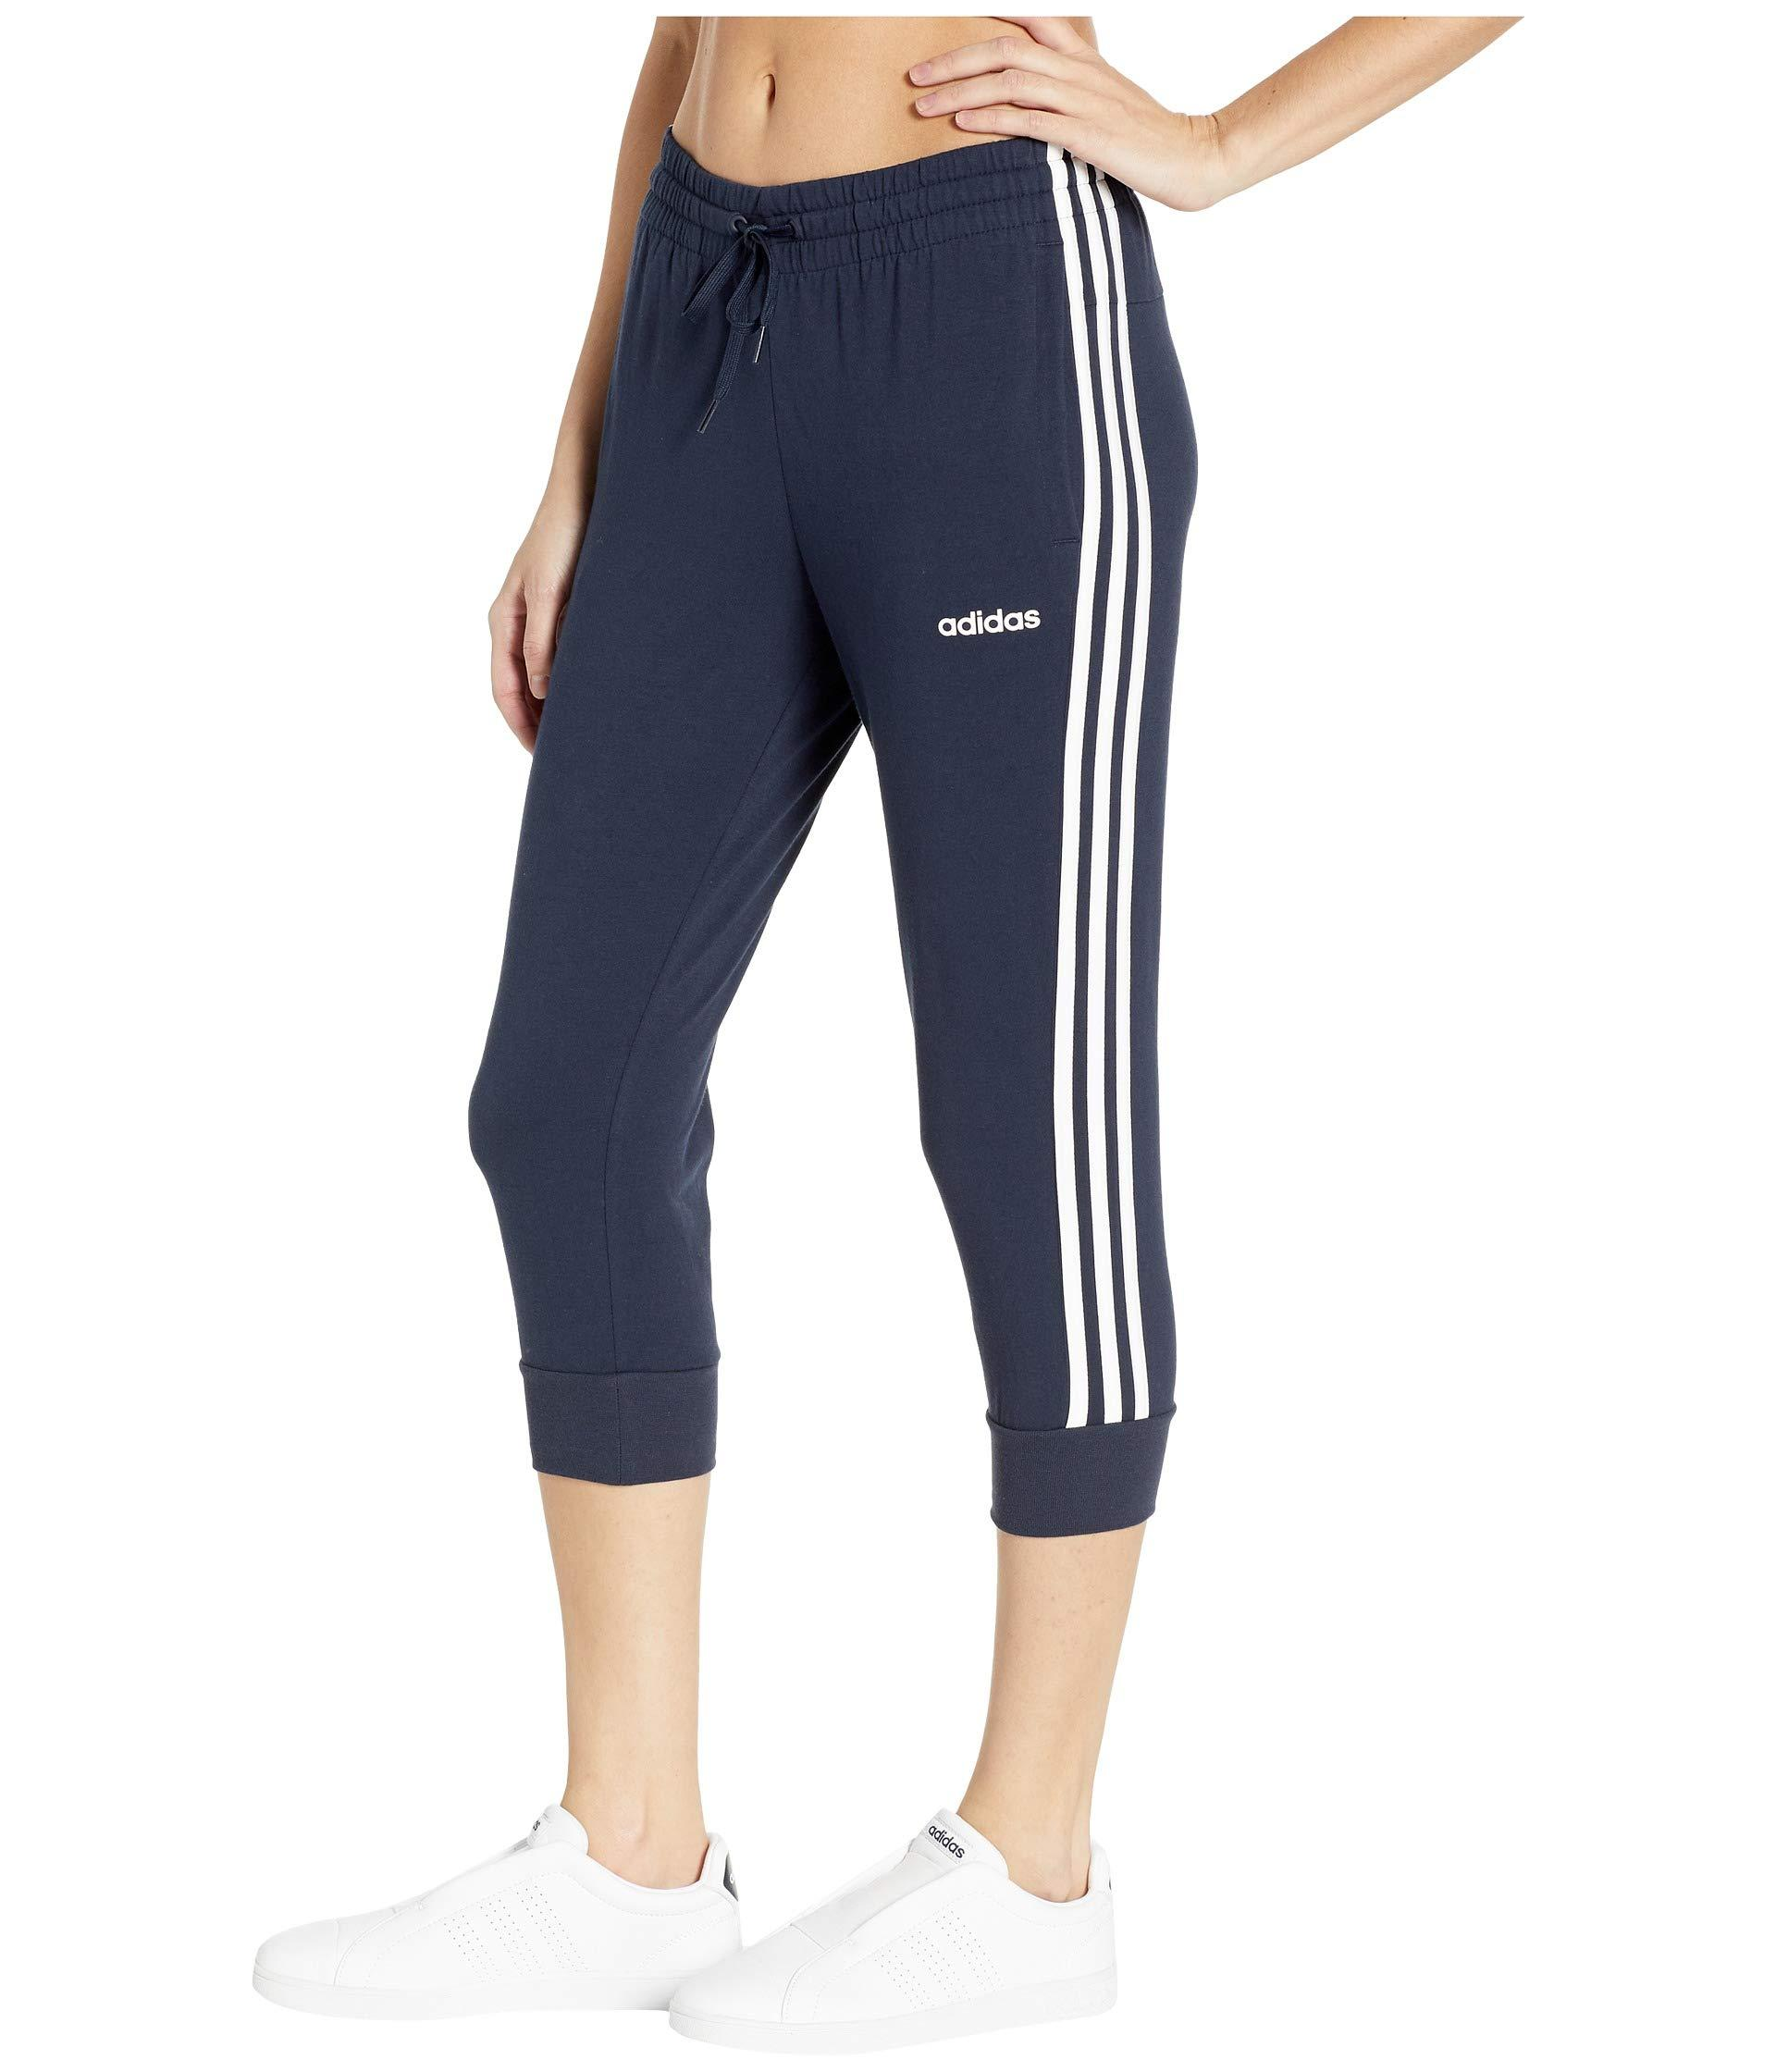 adidas Essential 3 stripes 34 Pants (blackwhite) Women's